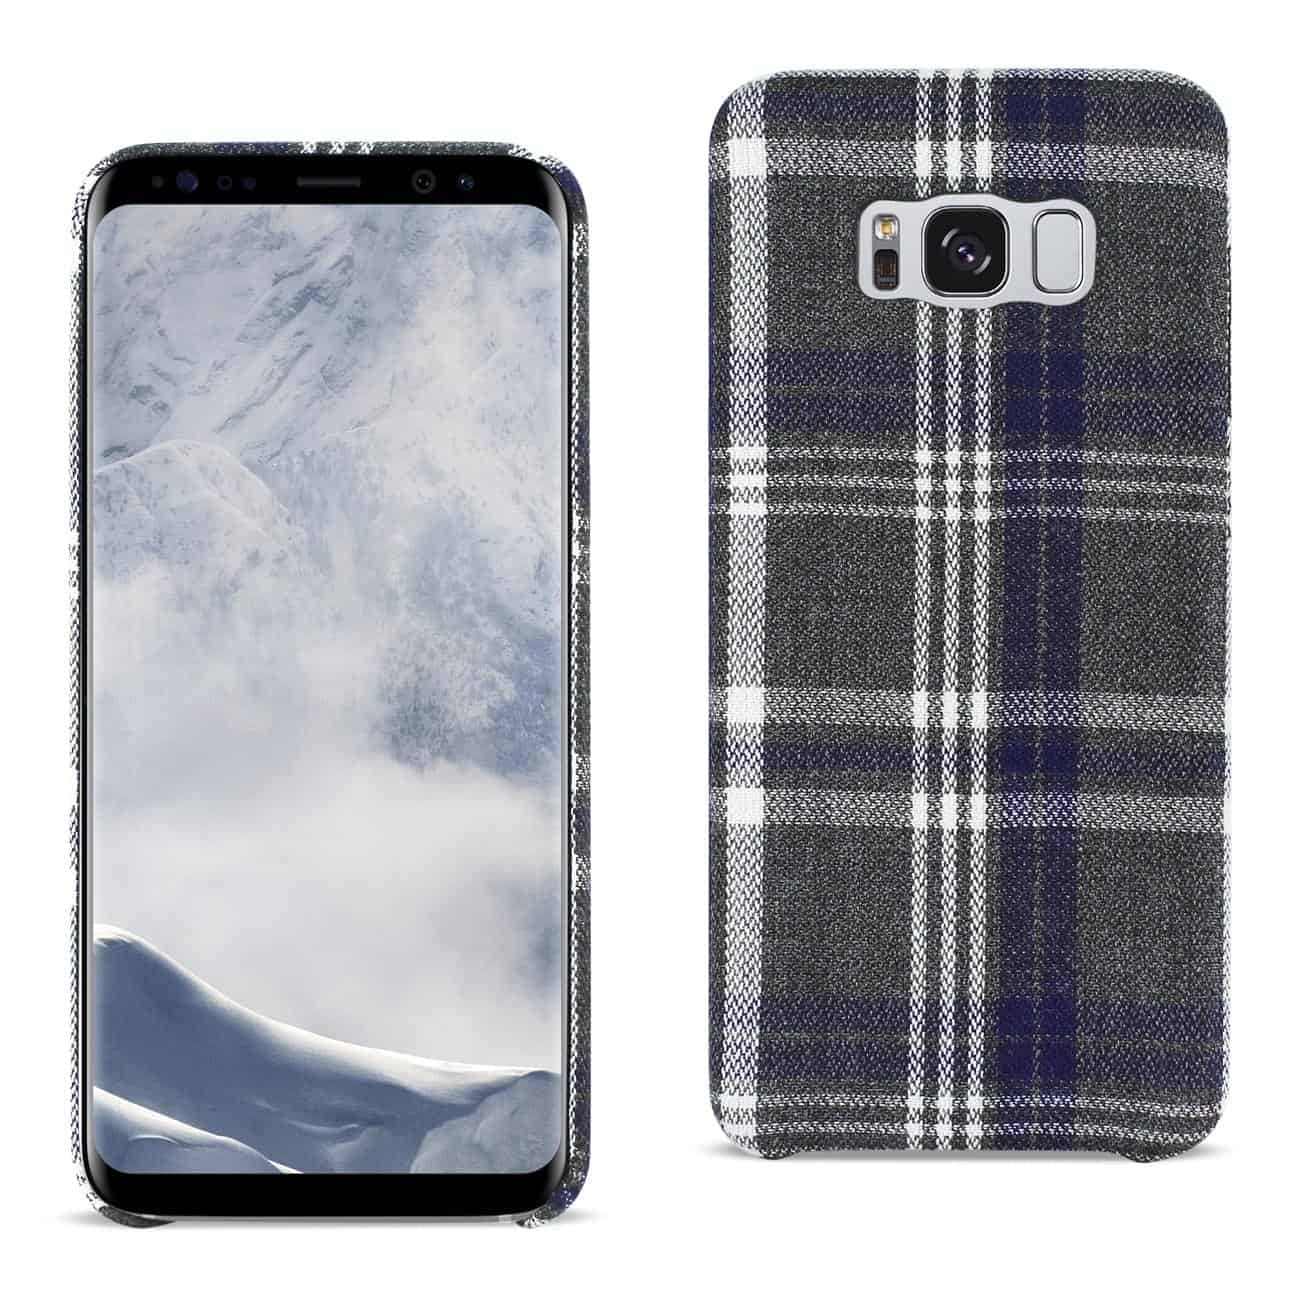 Samsung Galaxy S8 Edge Checked Fabric In Black